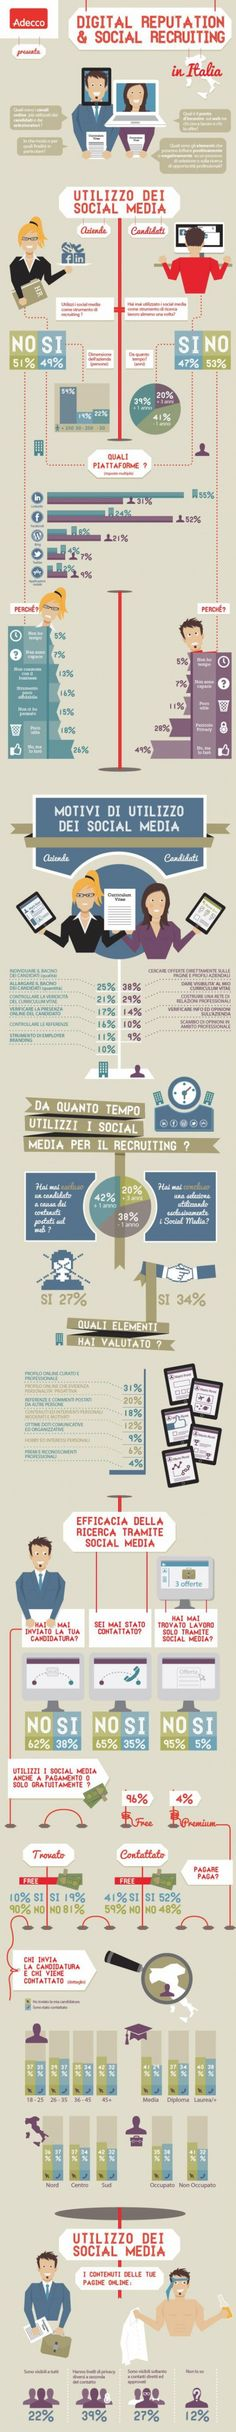 Digital Reputation & Social Recruiting